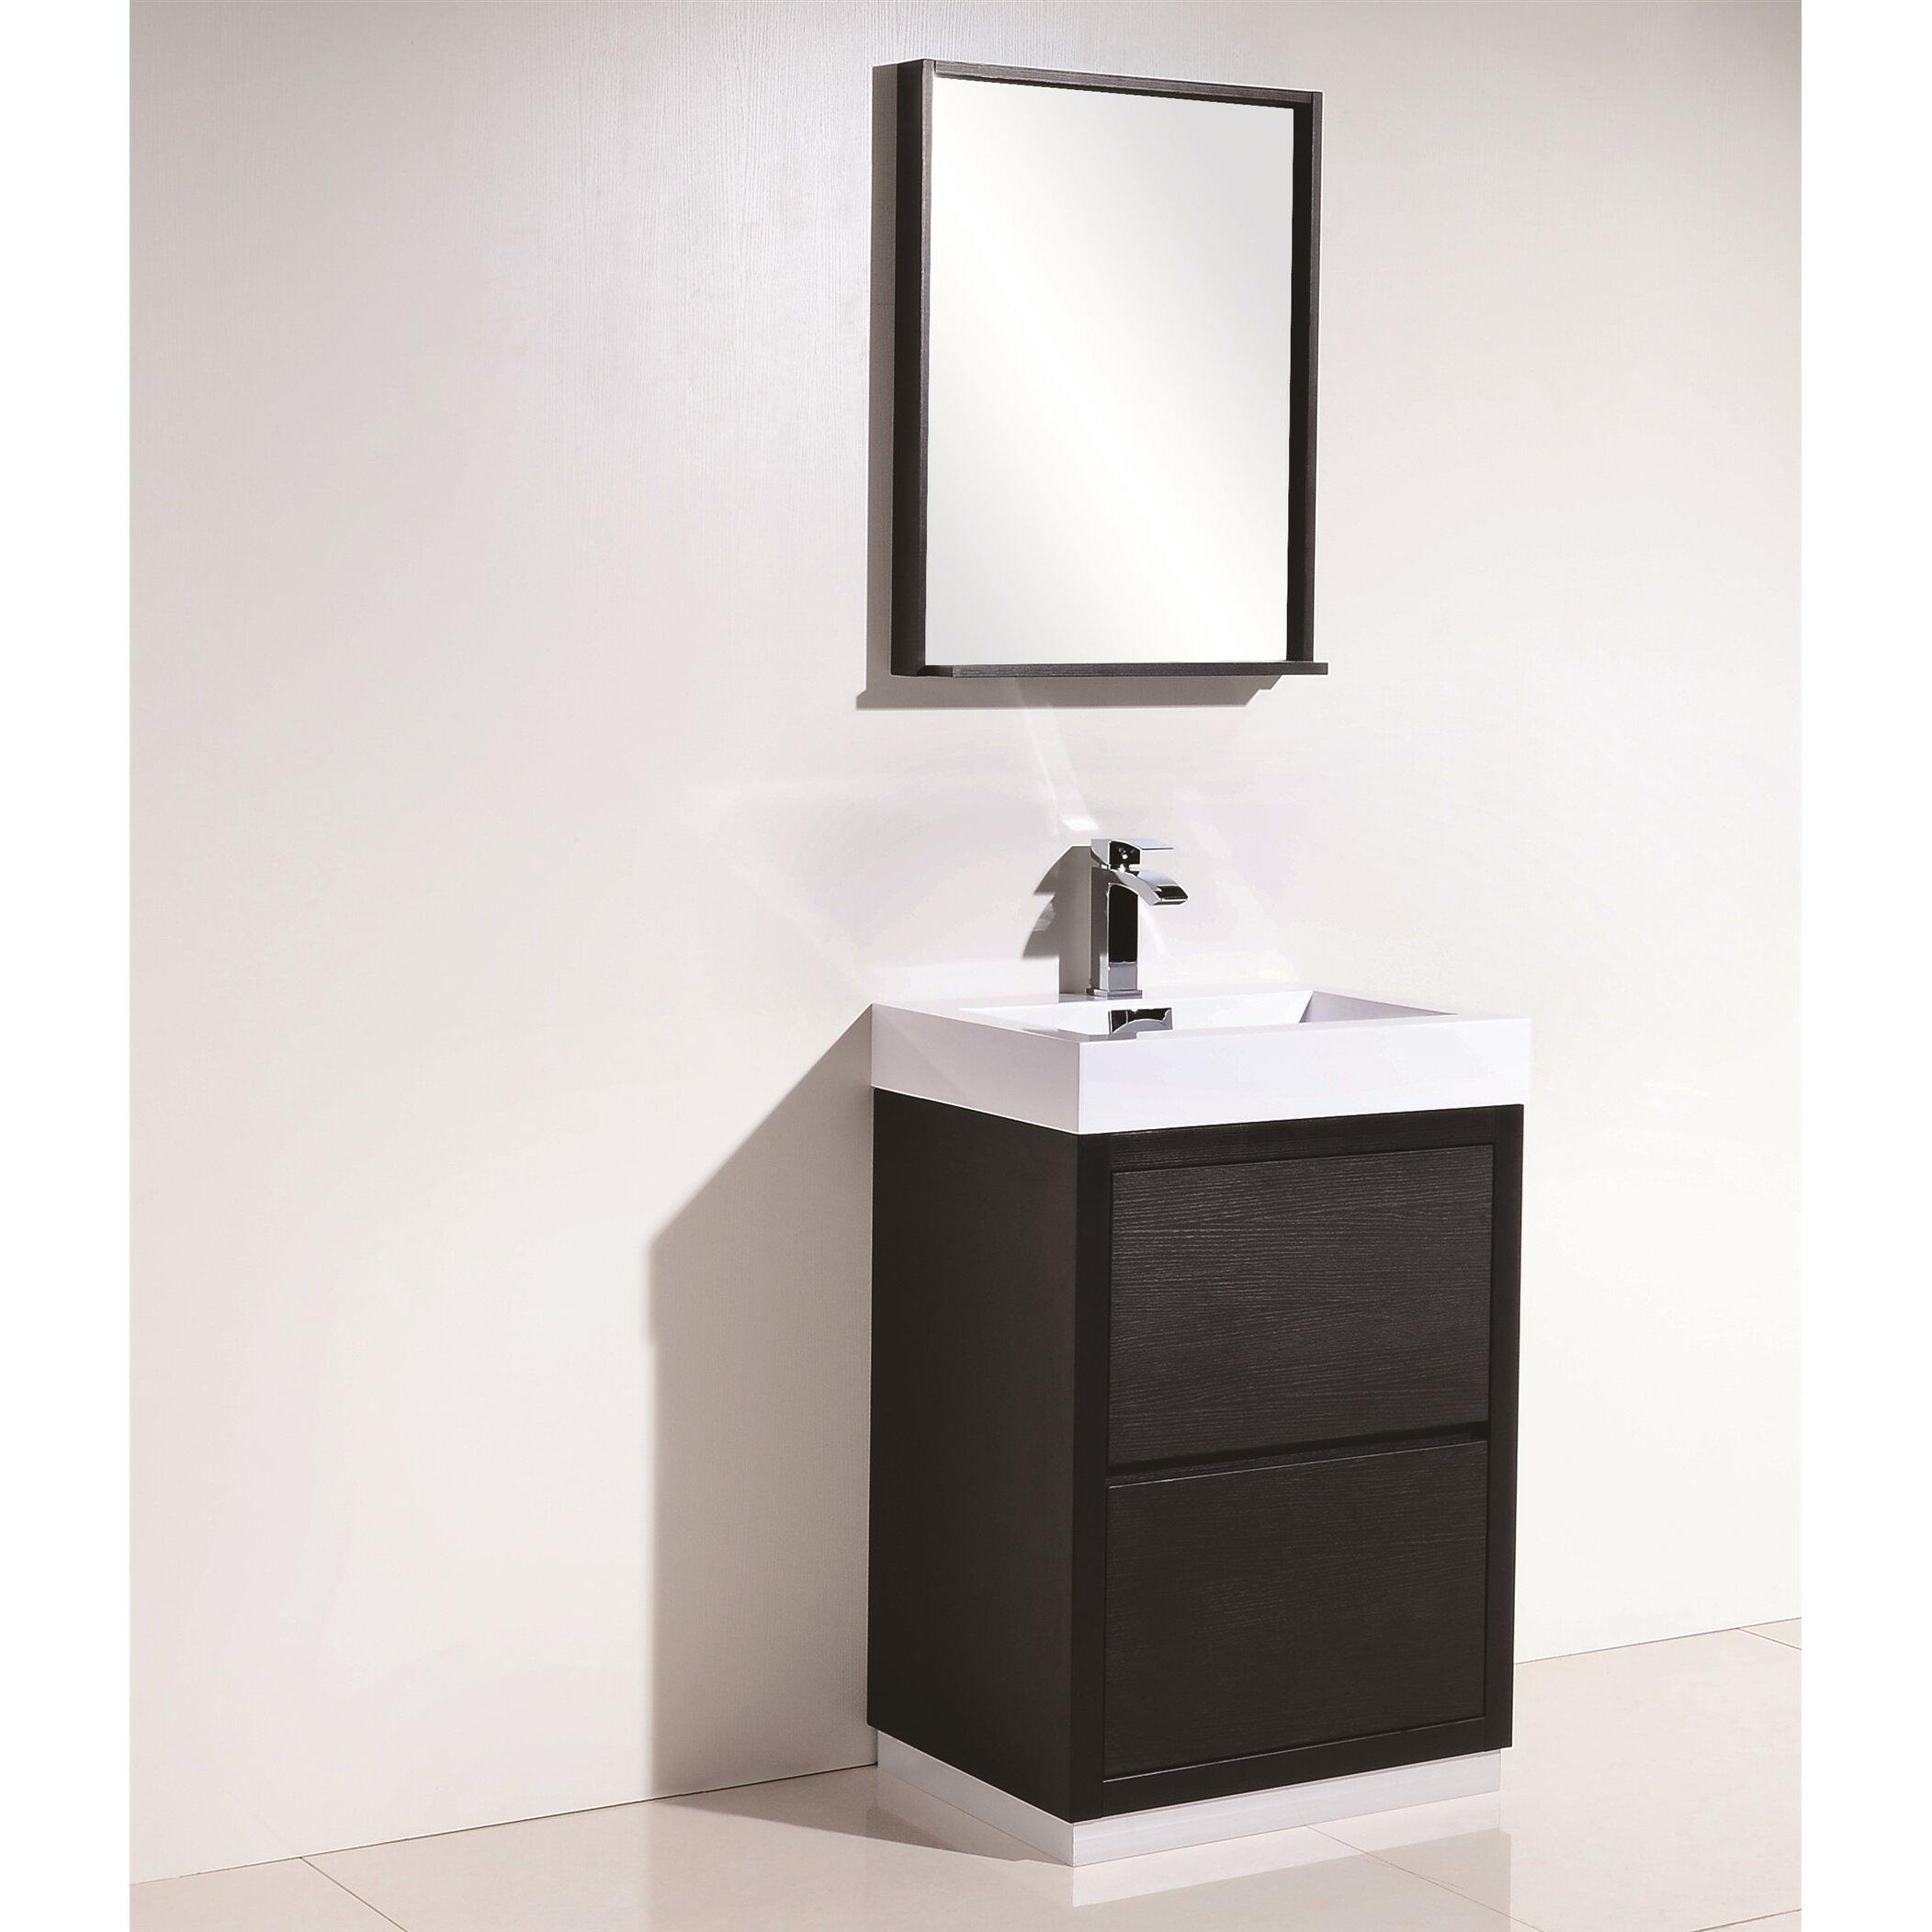 Kube bath bliss 24 single free standing modern bathroom - Contemporary bathroom vanity sets ...